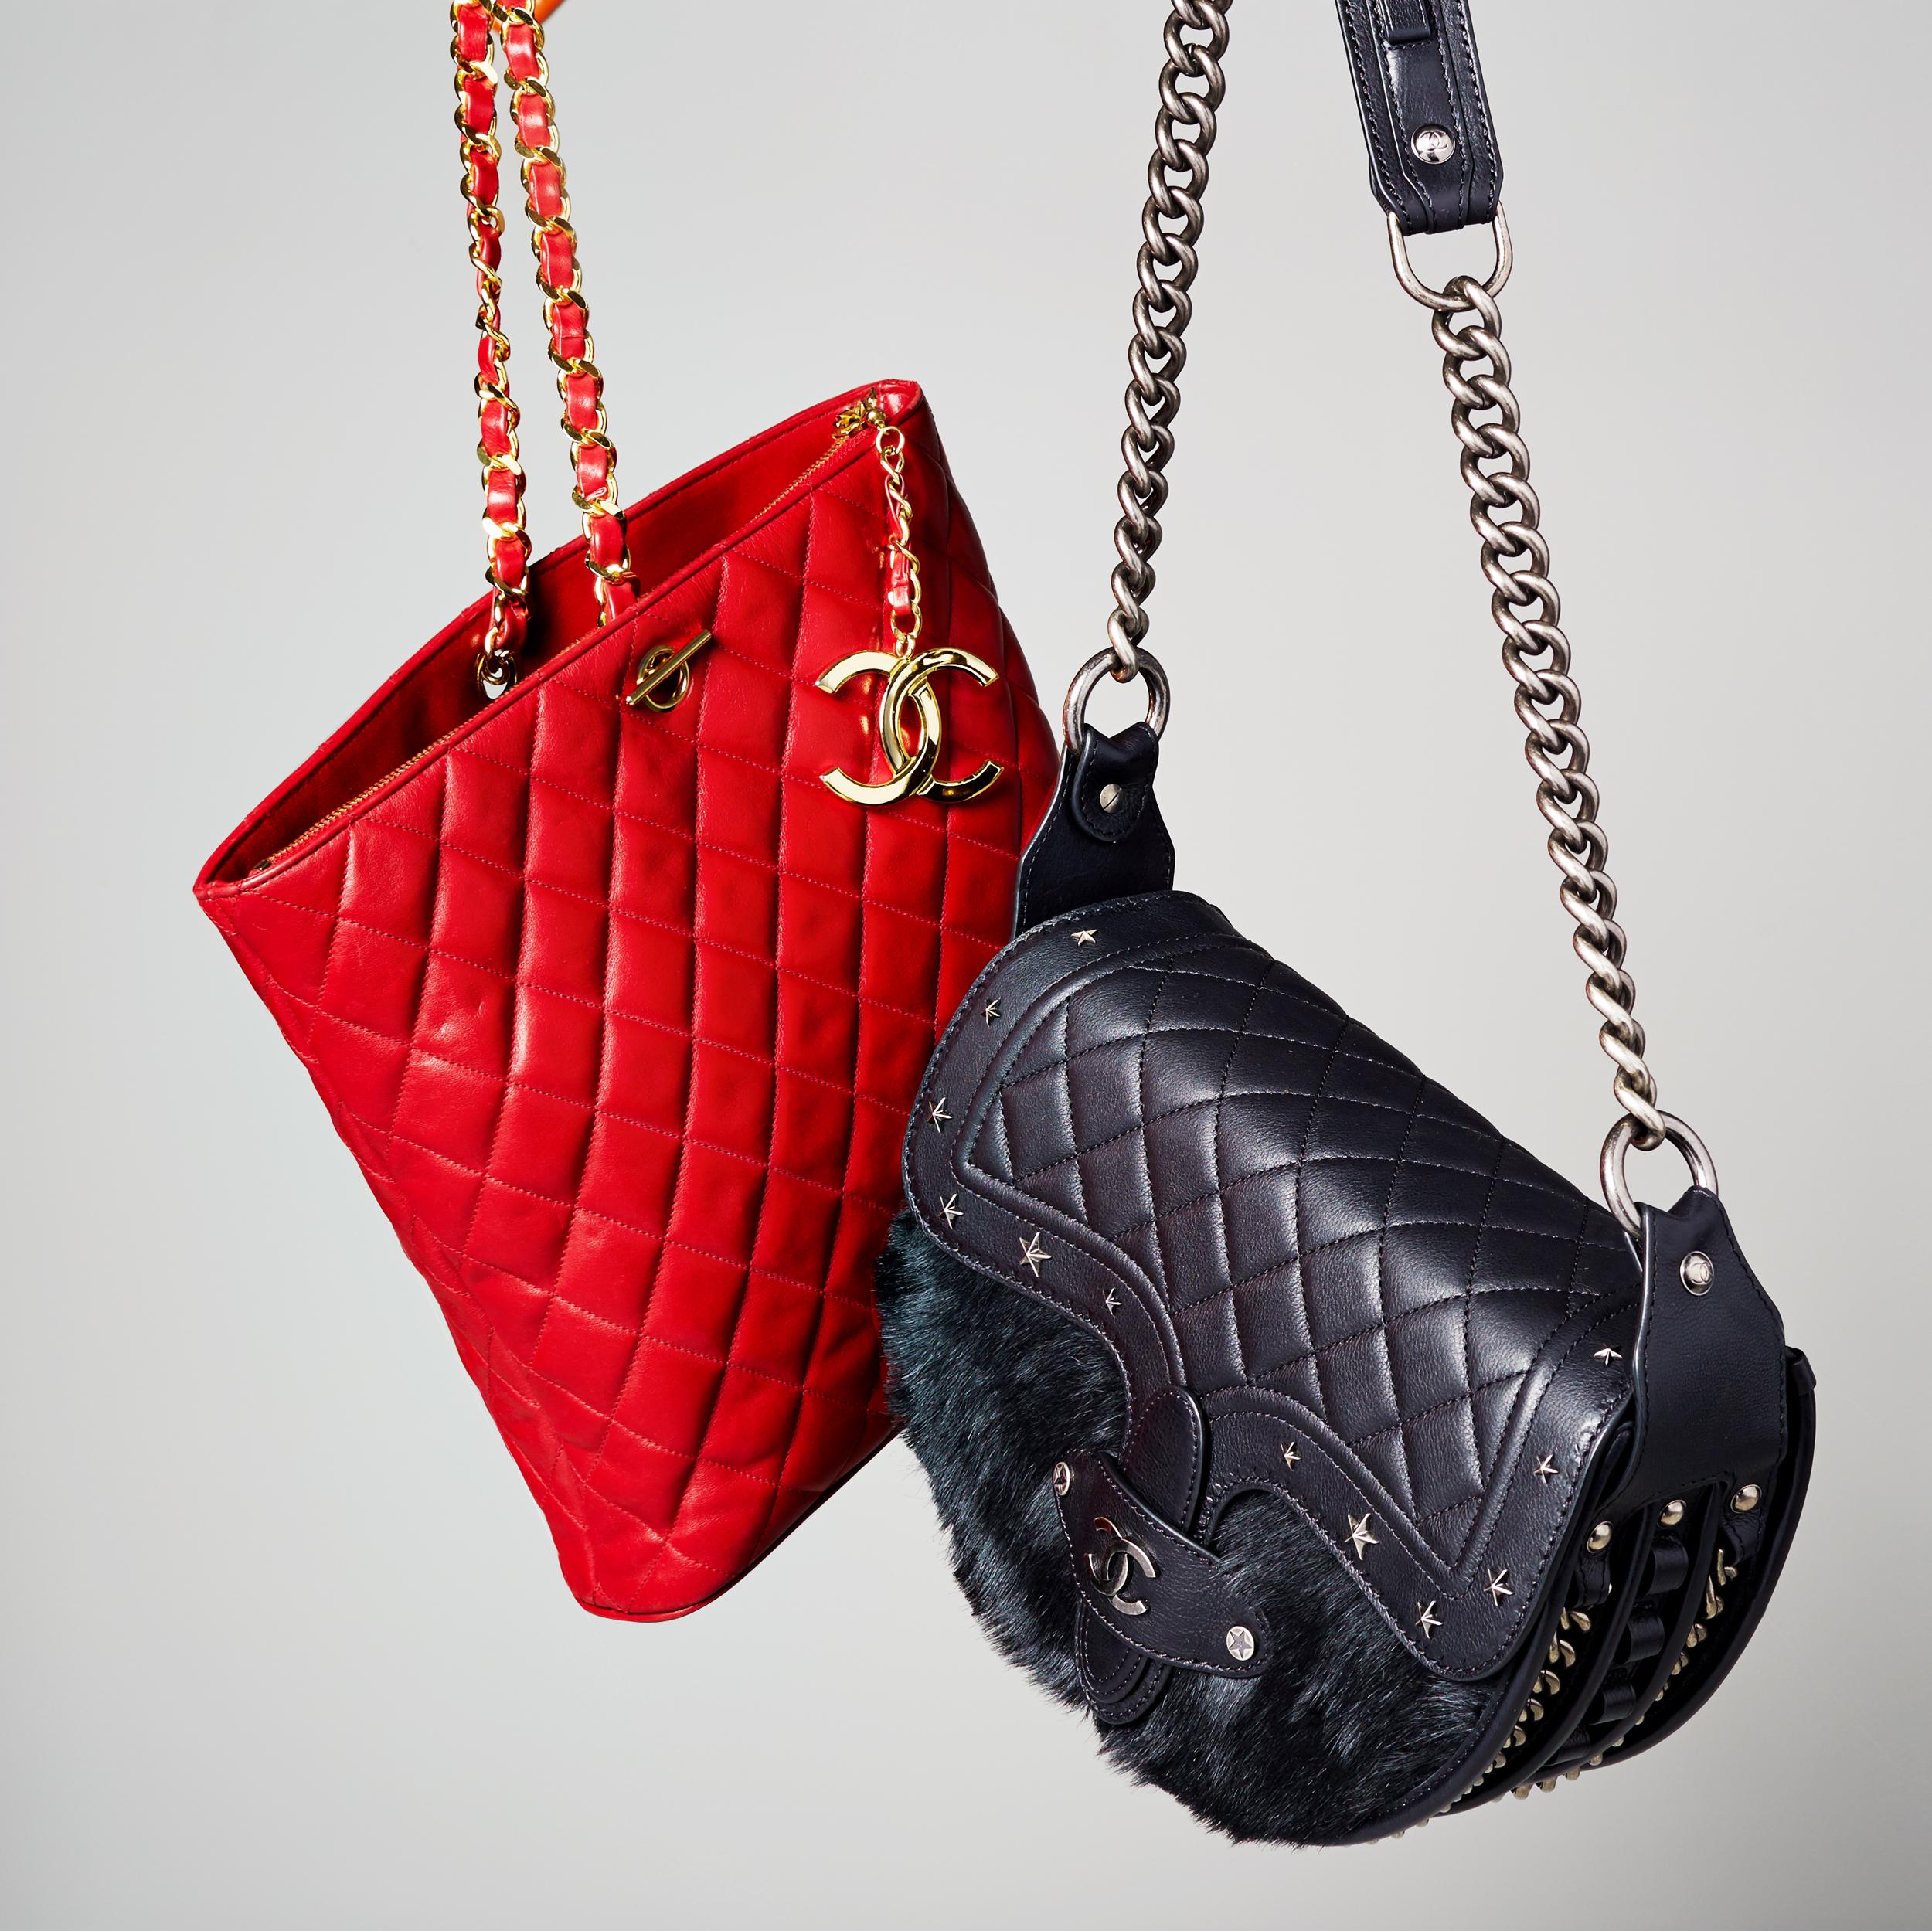 VintageChanel_WACC_Handbags_1088499505_EDITORIAL_195.jpg